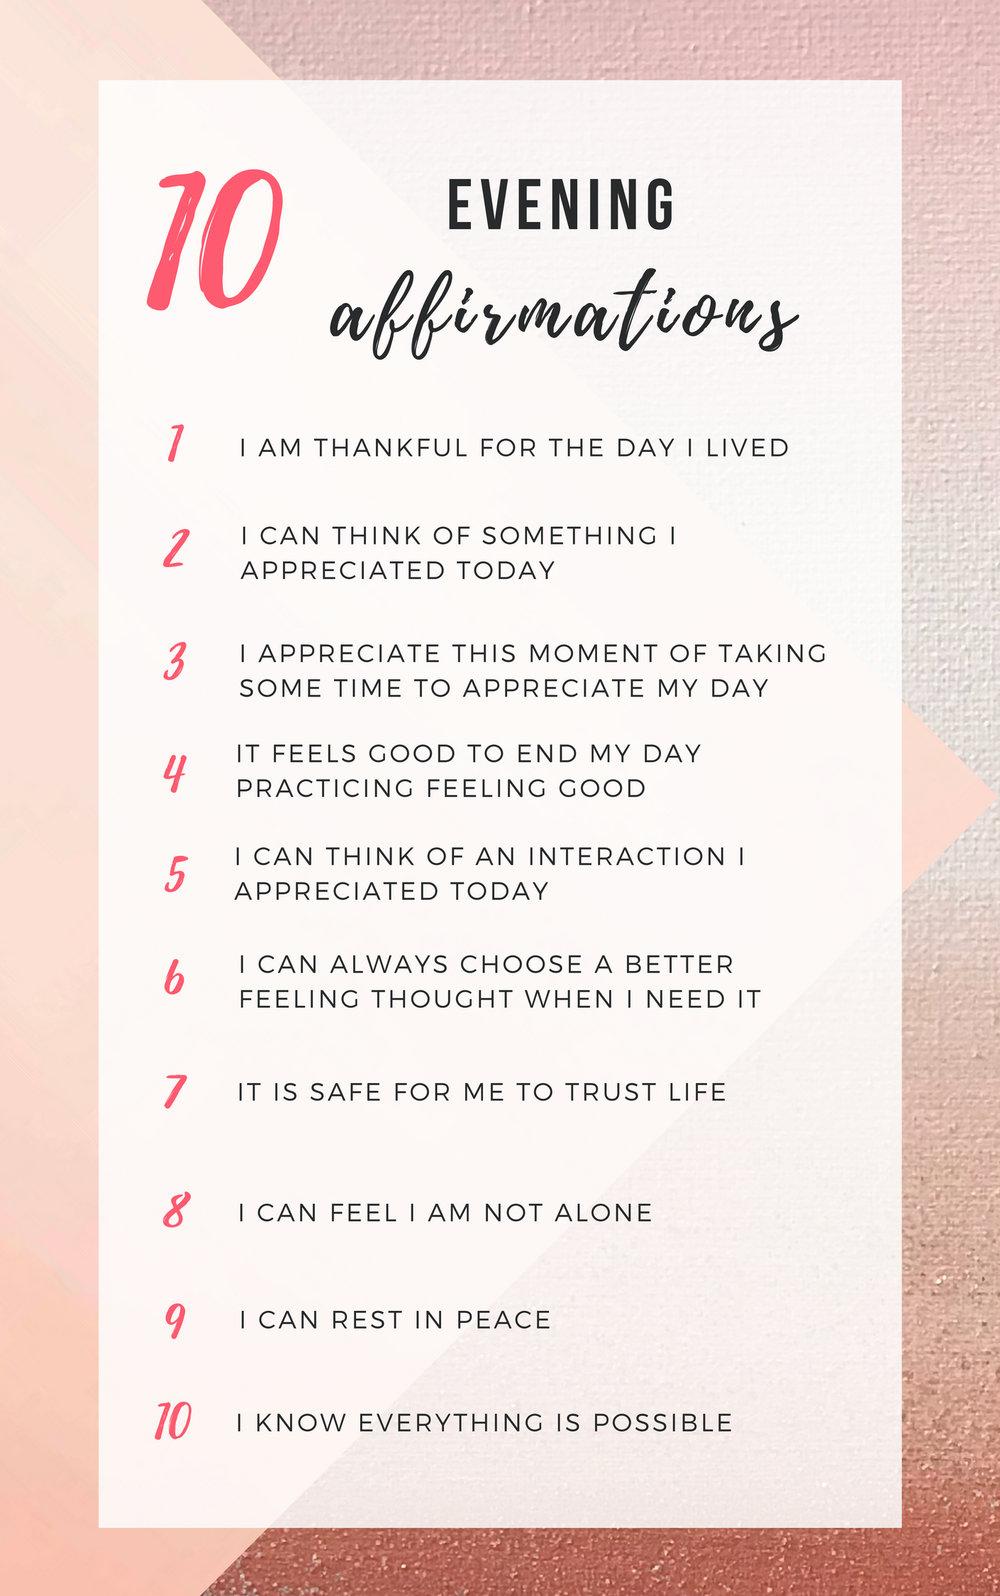 10 evening positive affirmations.com.jpg